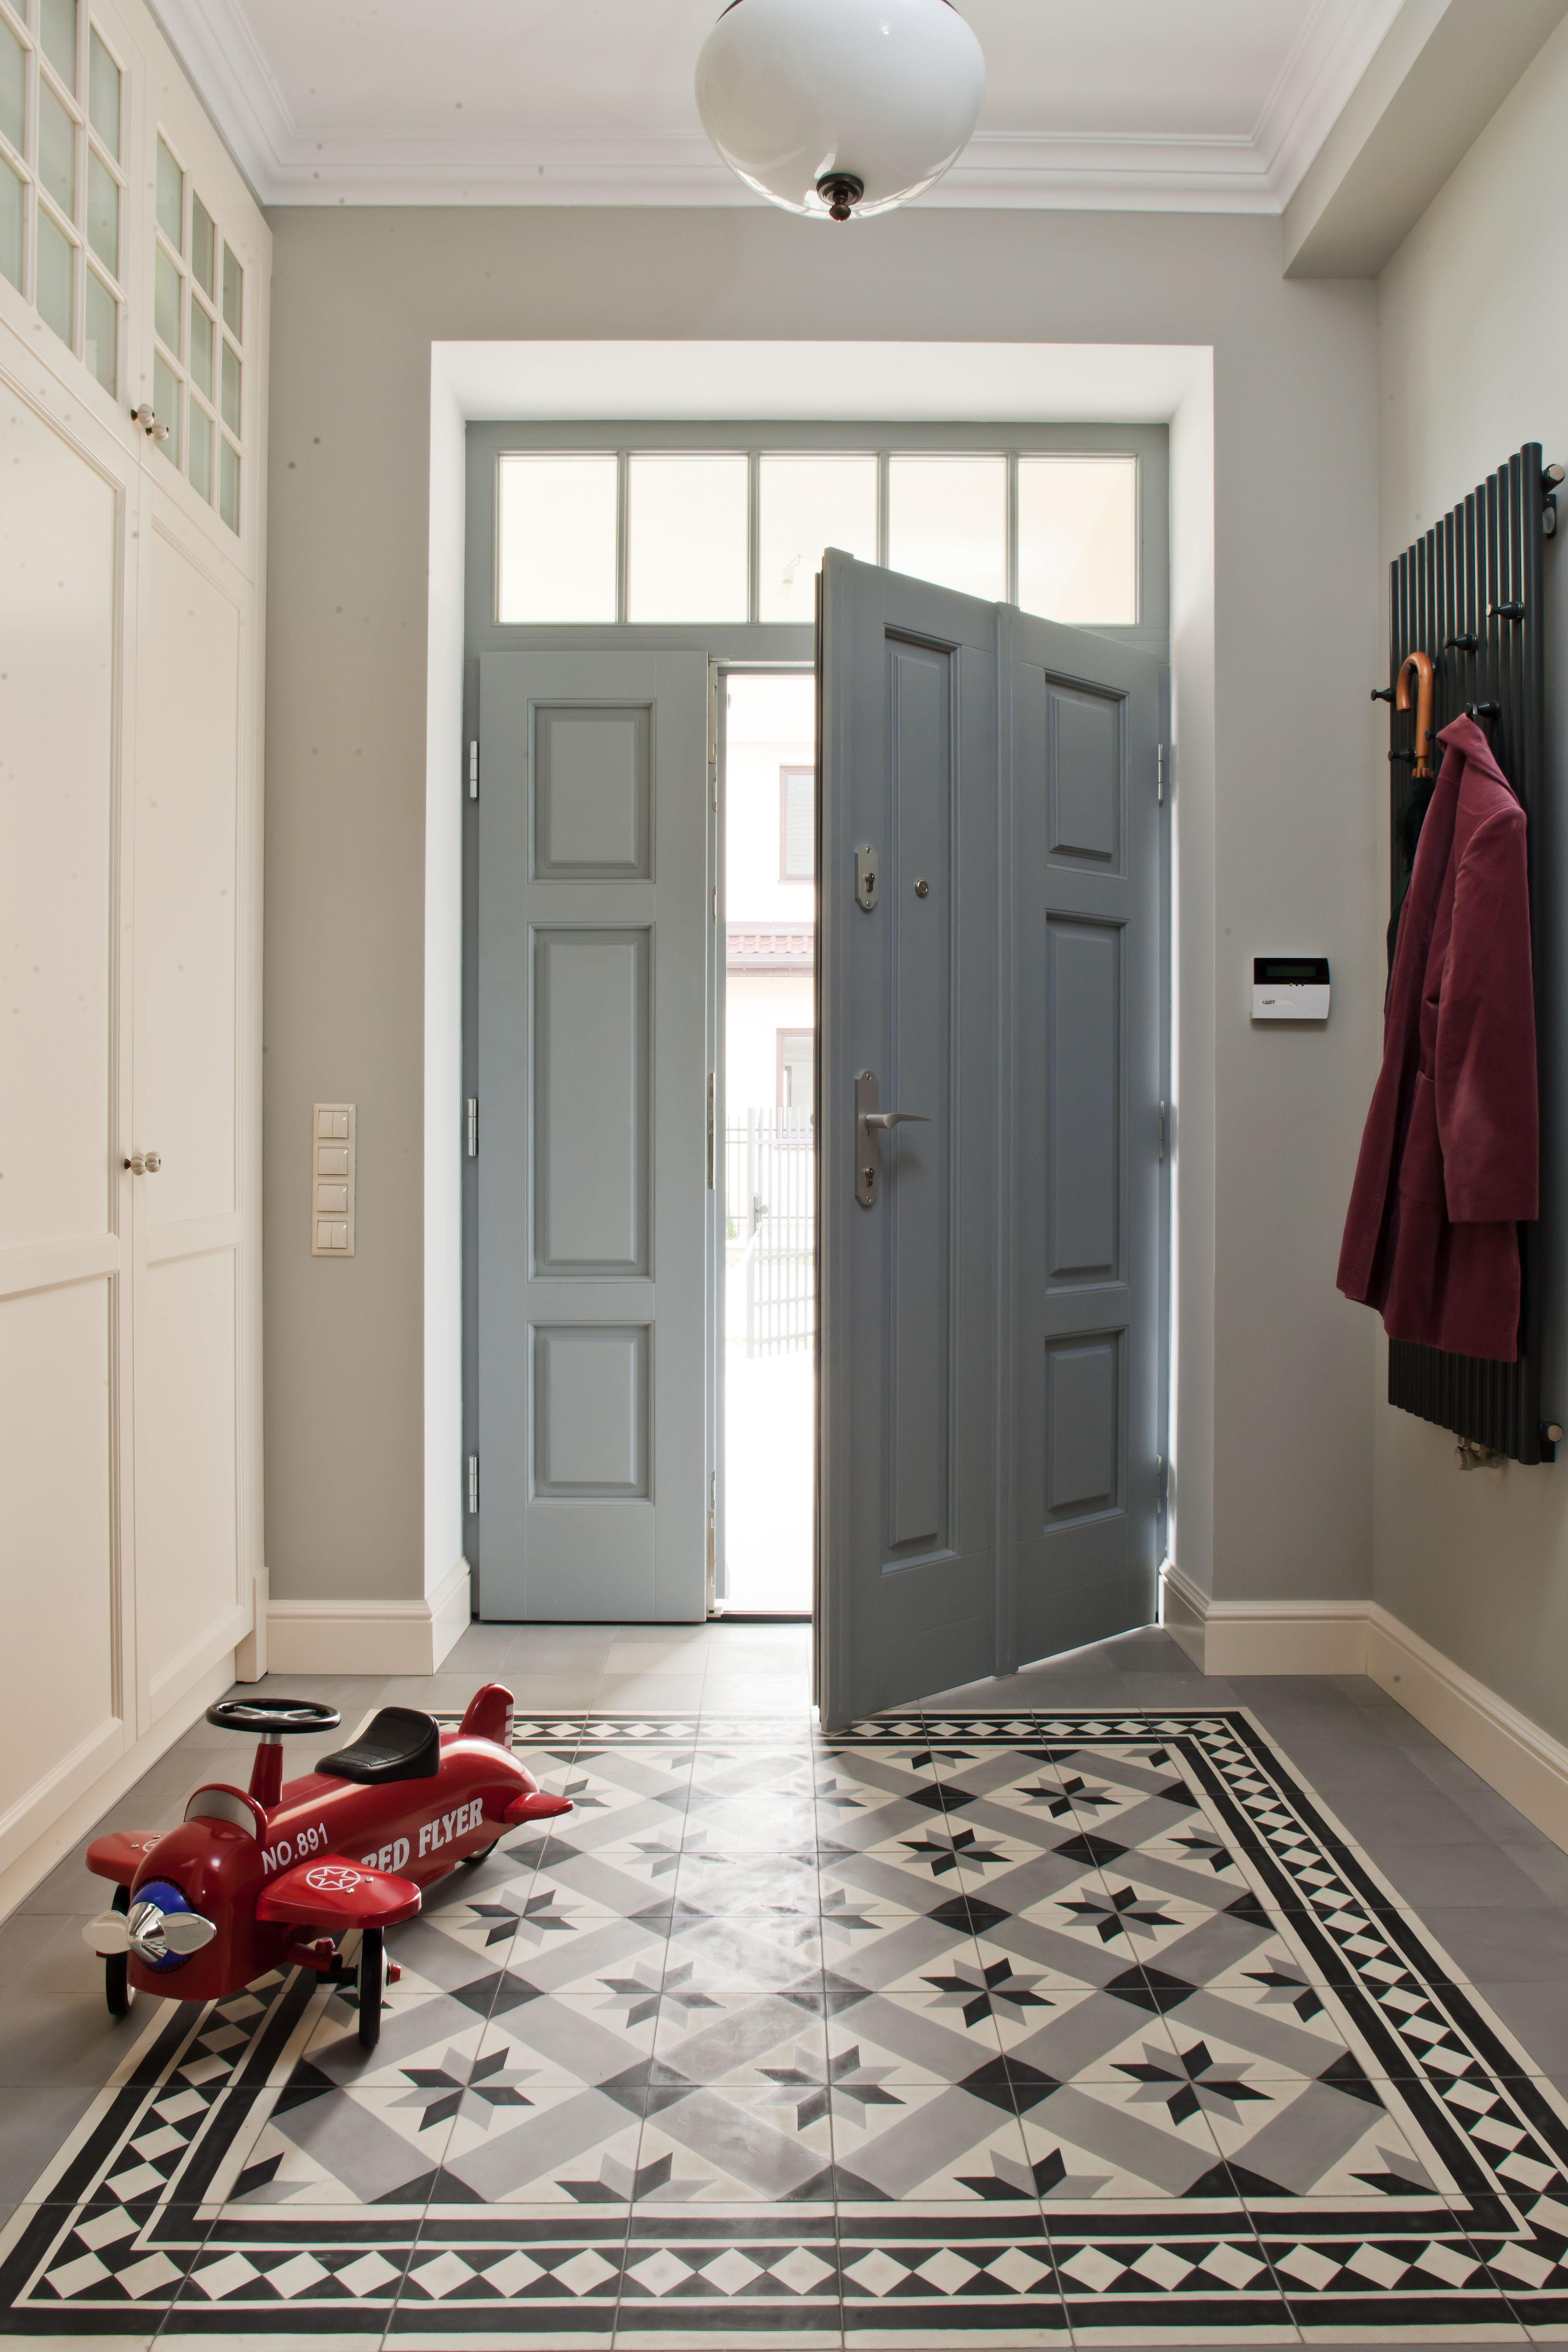 Red plane (photo by Rafał Lipski). Floor tiles: Purpura. #cementtiles